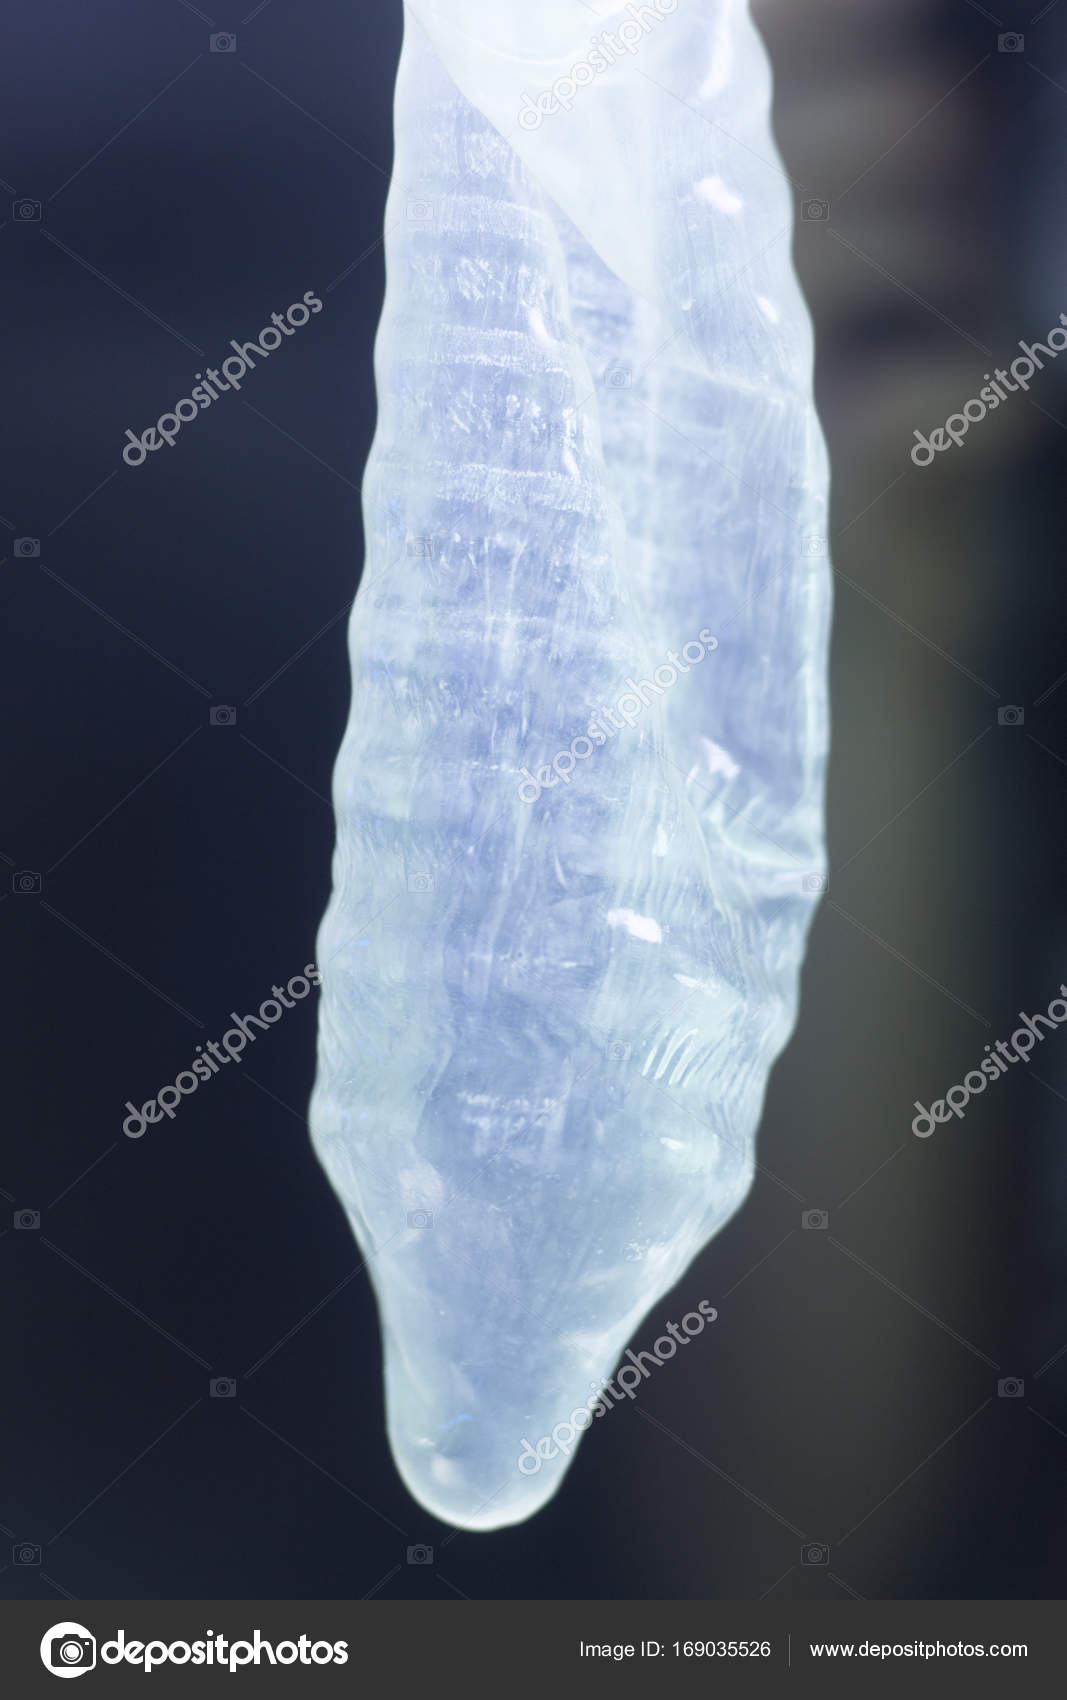 Can anyone buy condoms